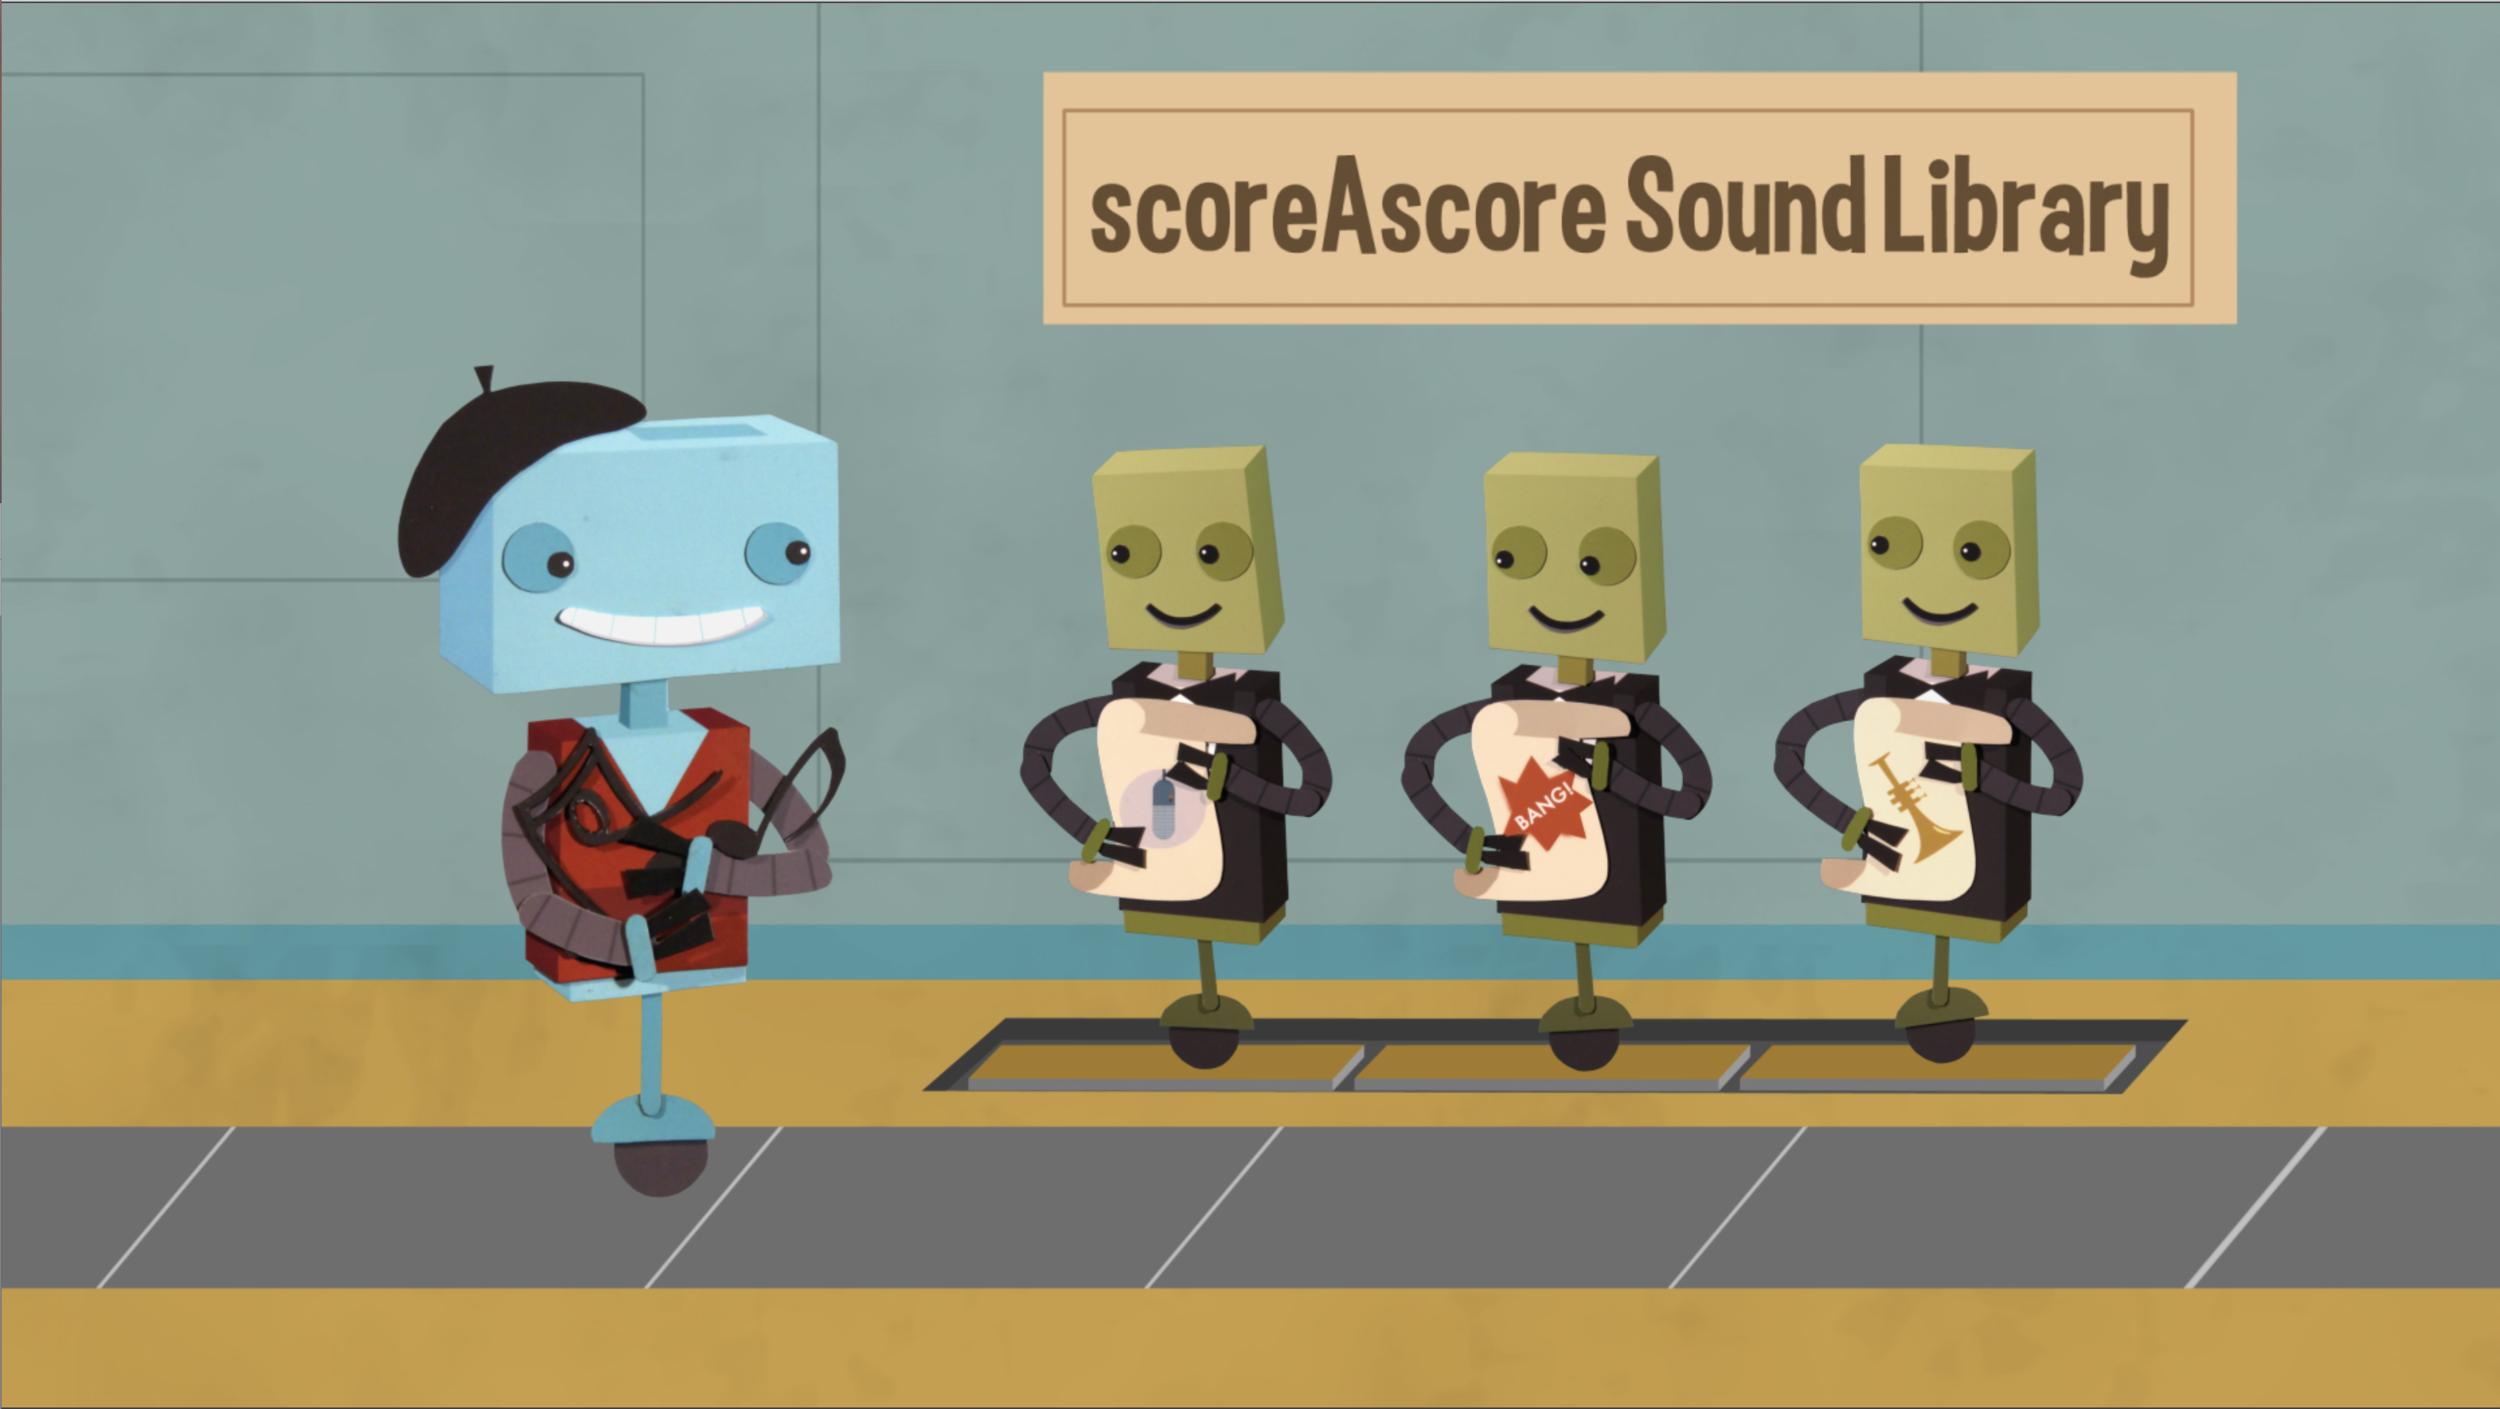 scoreAscore.com - 'The Future'